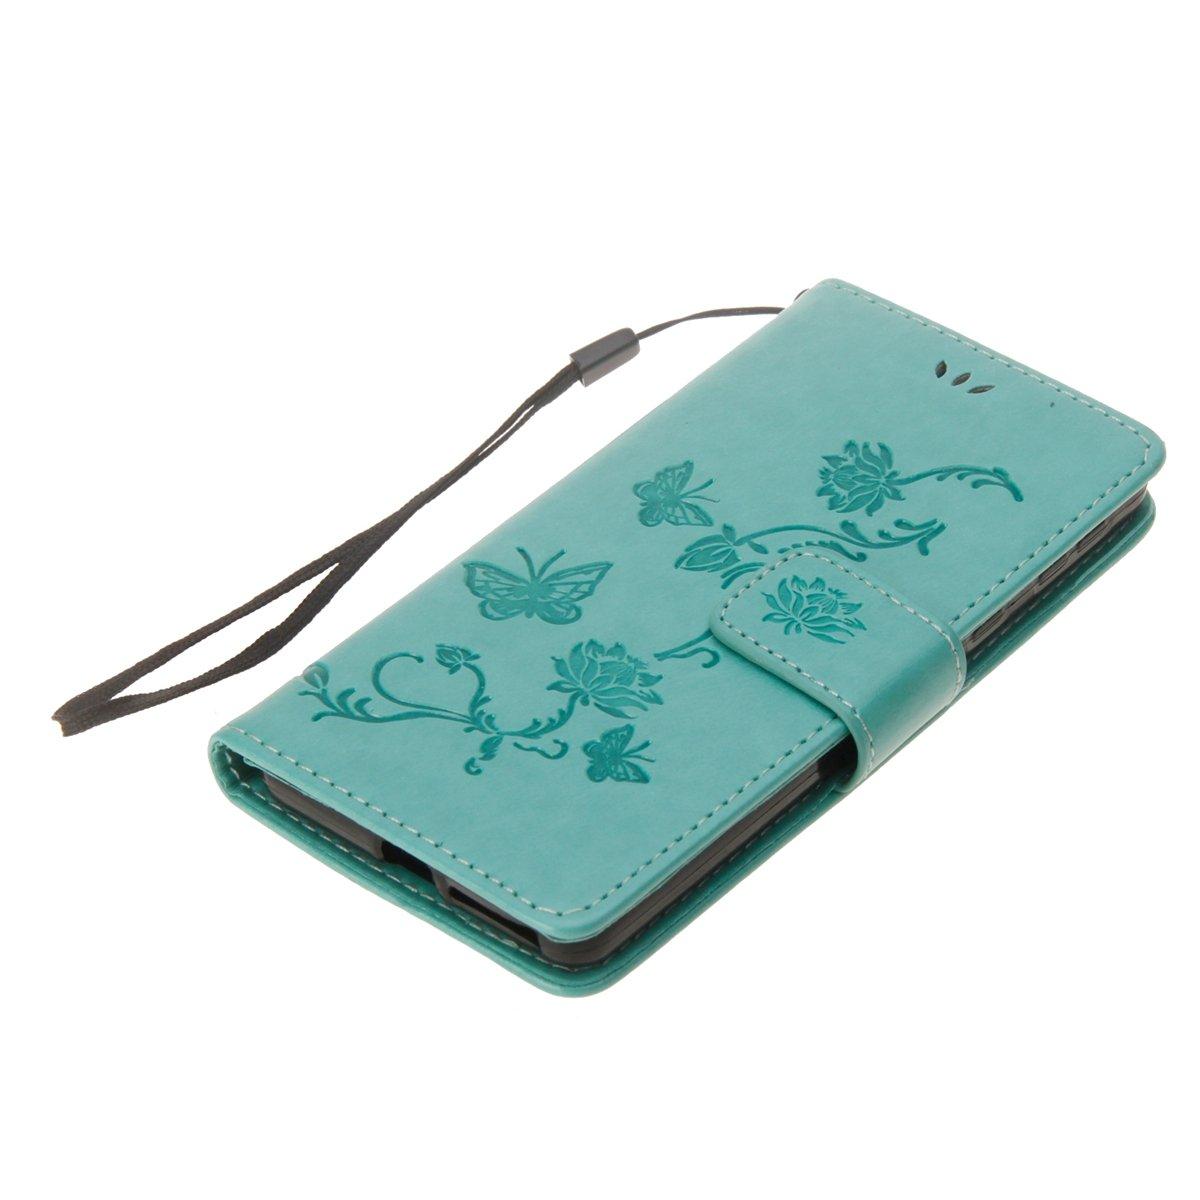 Herbests Kompatibel mit Sony Xperia E5 H/ülle Tasche Leder Flip Case Schmetterling Blumen Muster Retro Lederh/ülle Schutzh/ülle Handyh/ülle Wallet Cover Bookstyle Handytasche St/änder,lila